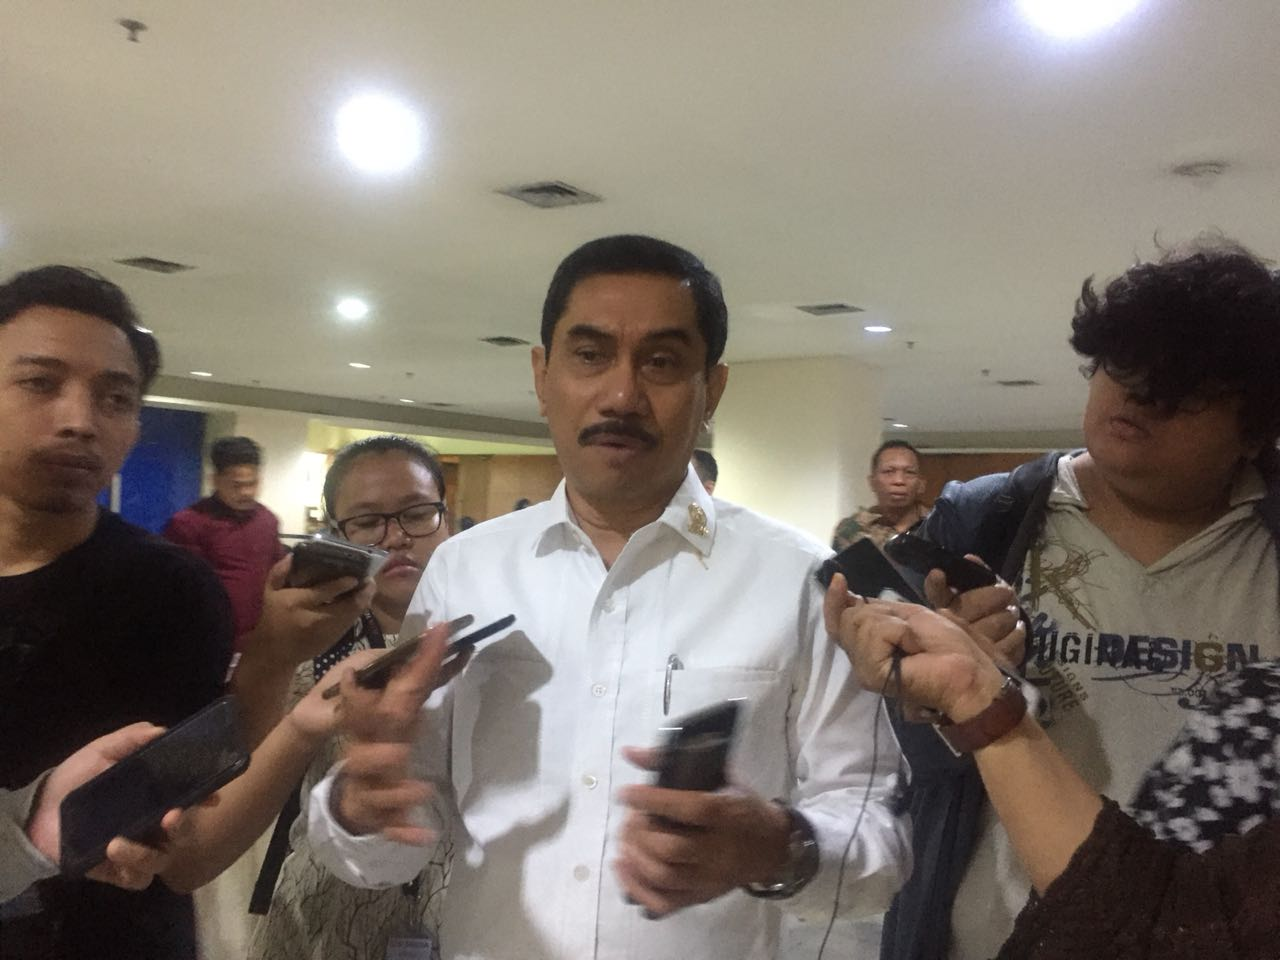 BNPT Minta Rektor Berdayakan Sivitas Akademik Tangkal Radikalisme